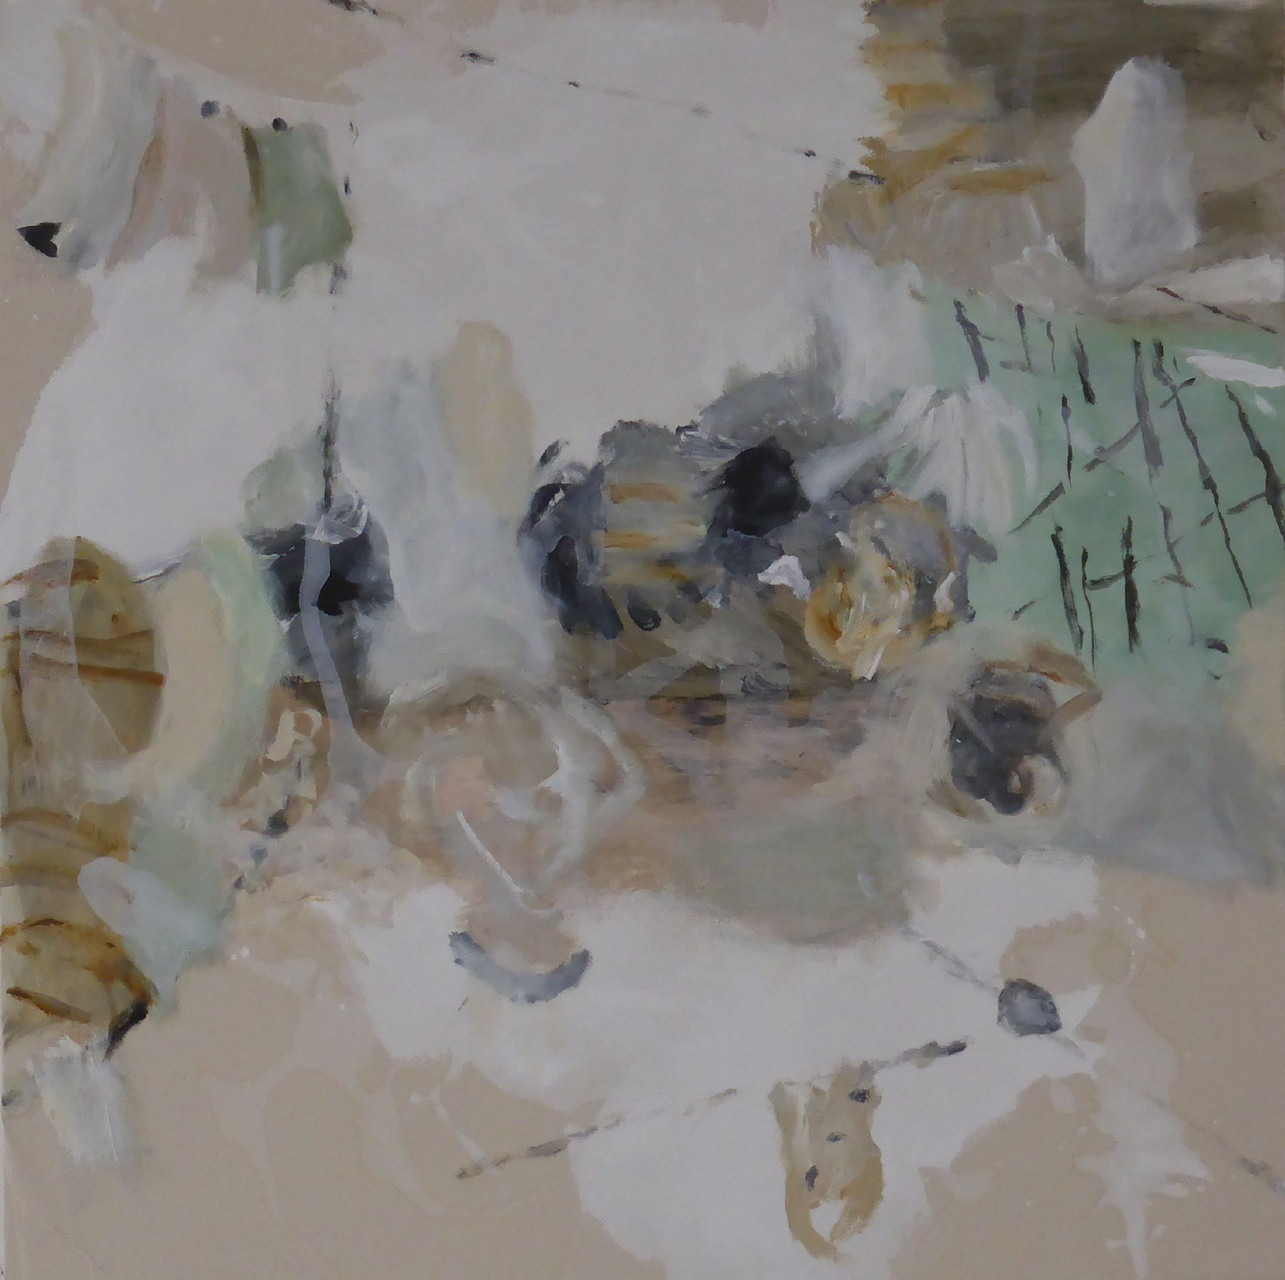 Hinter den Dingen VI, Acryl/Lwd., 80 x 80 cm, 2013